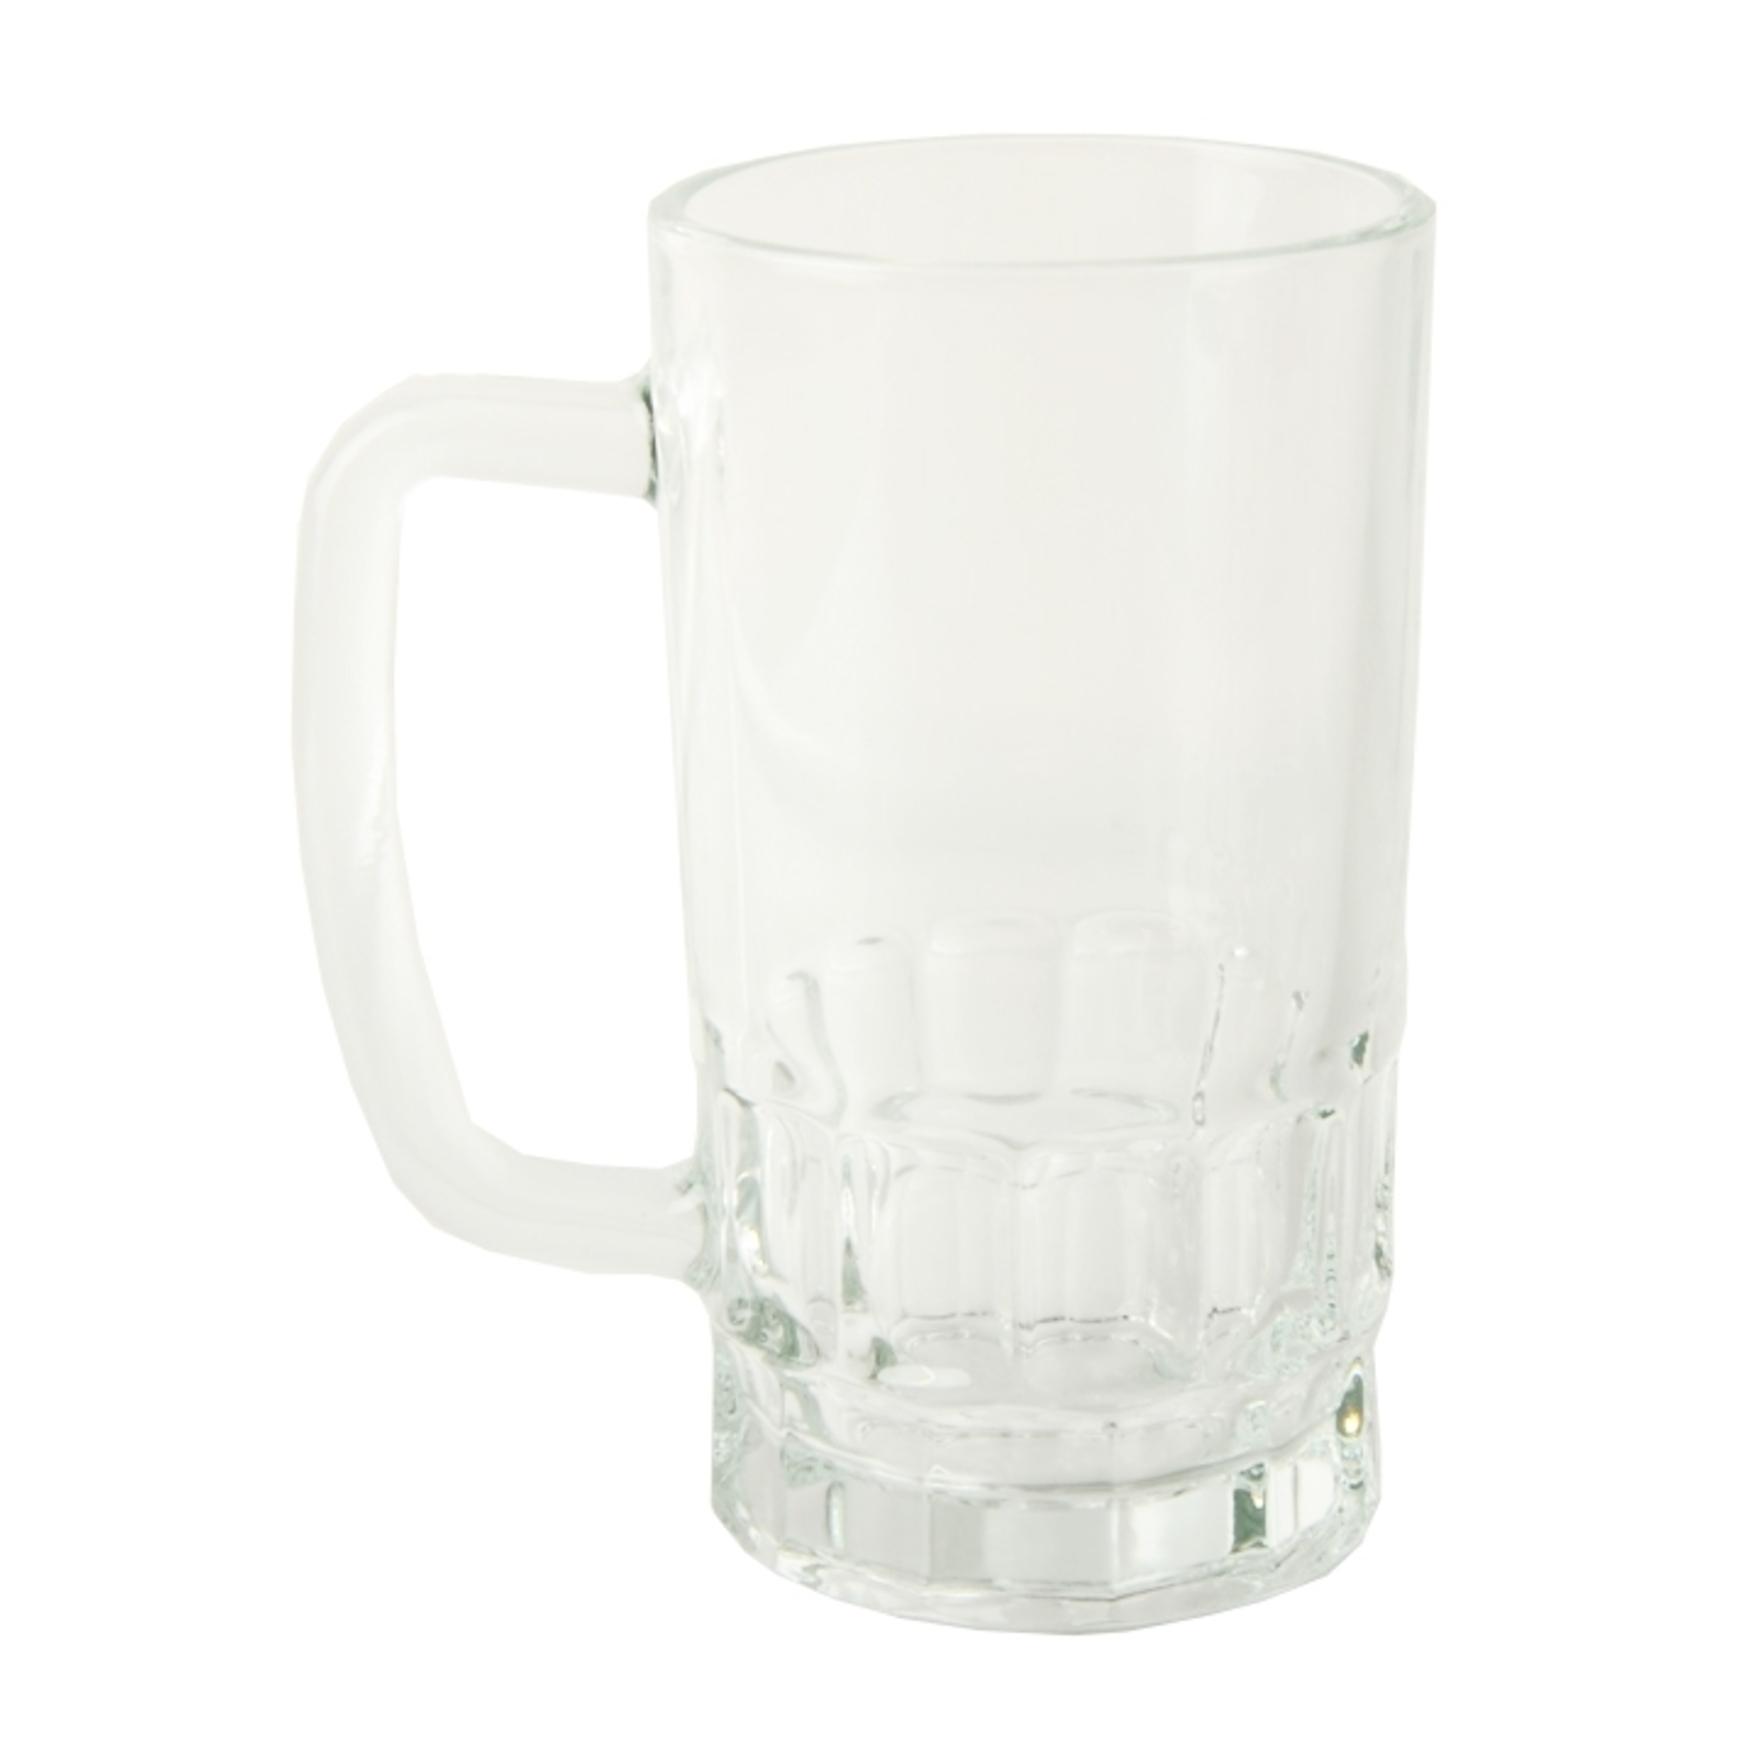 336decb71914fa Mugs - bière 24 carton verre chope, 22 oz, 15,6cm haut de Secabo